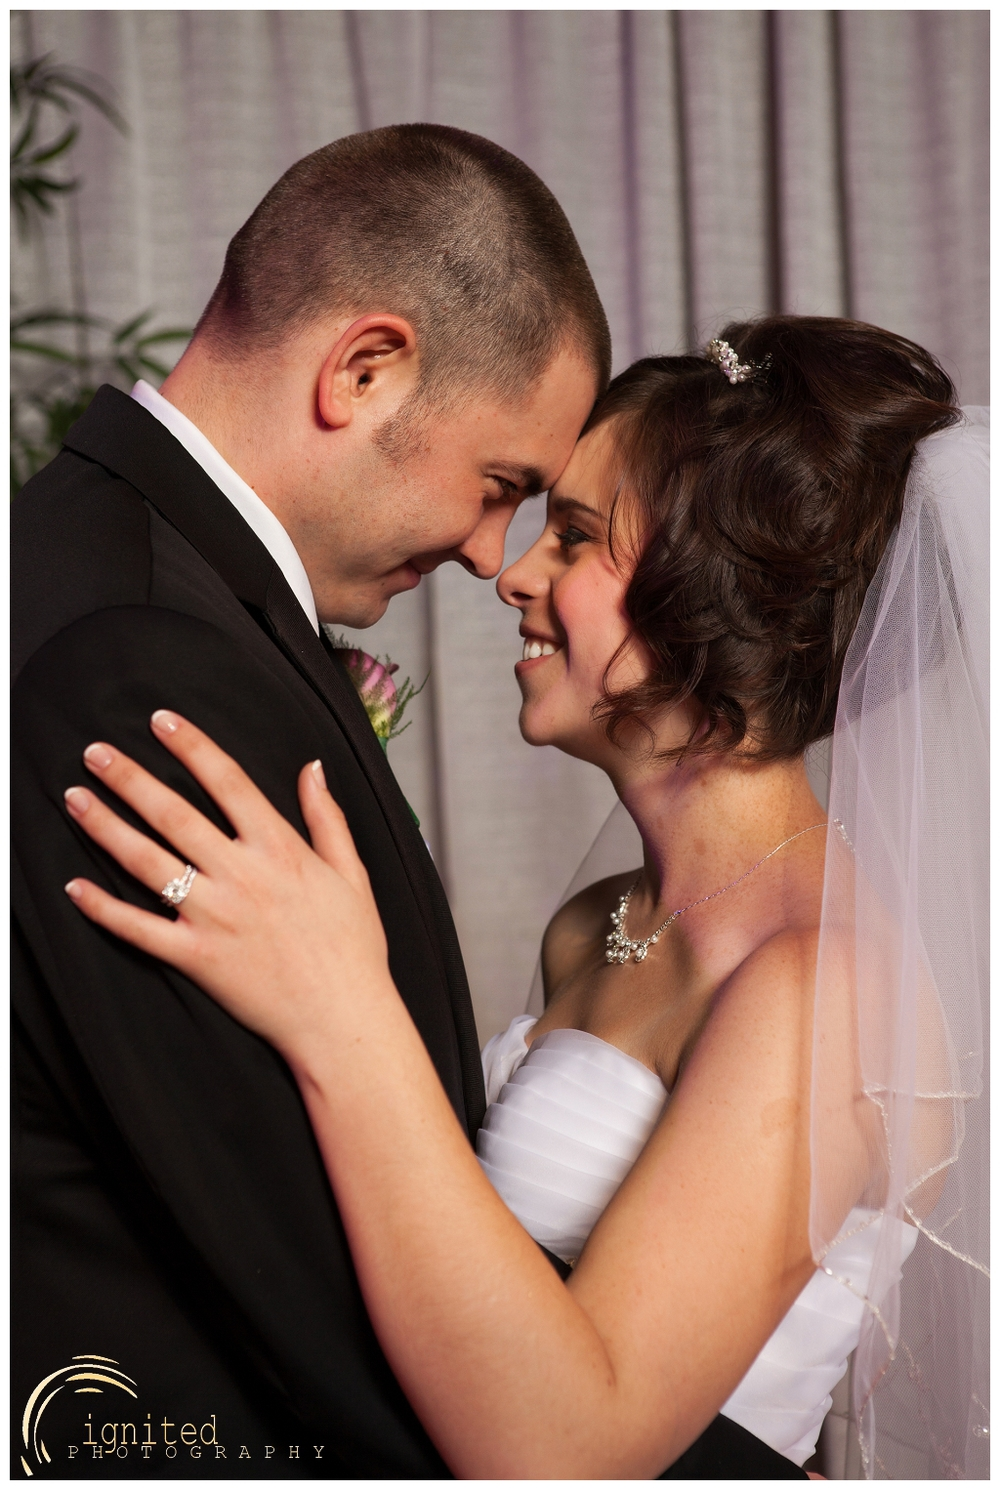 ignited Photography Alyssa  Castwell and Caleb Merna Wedding Brighton Nazarene The Naz Howell MI_0042.jpg